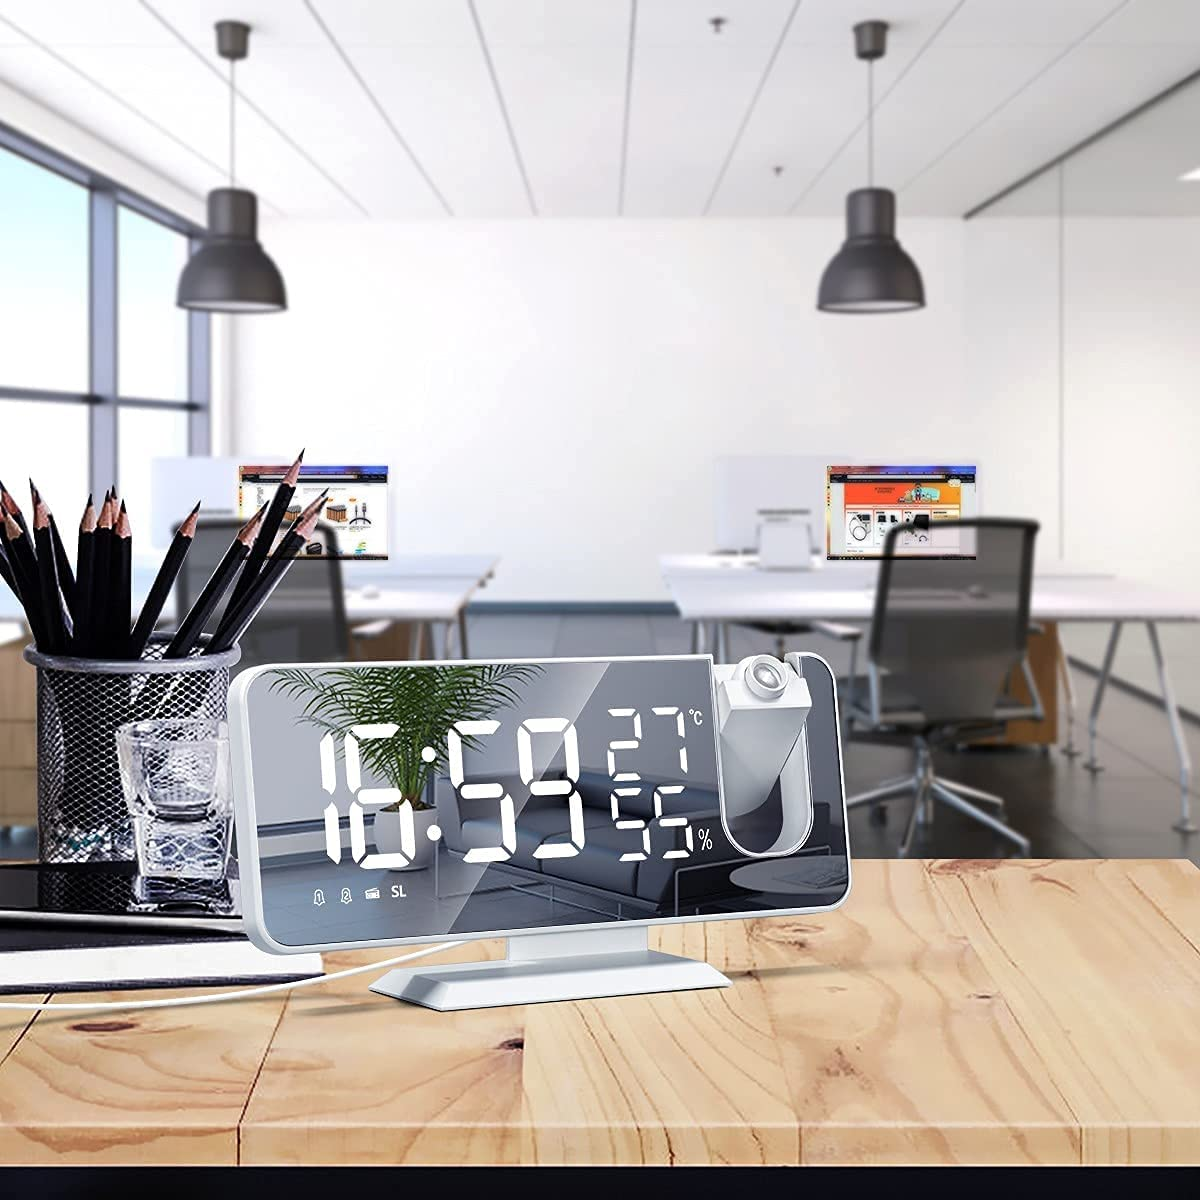 Free shipping Shavanpark Digital Alarm Clock 5.3 Regular store Mirrored Large LED inch Cloc